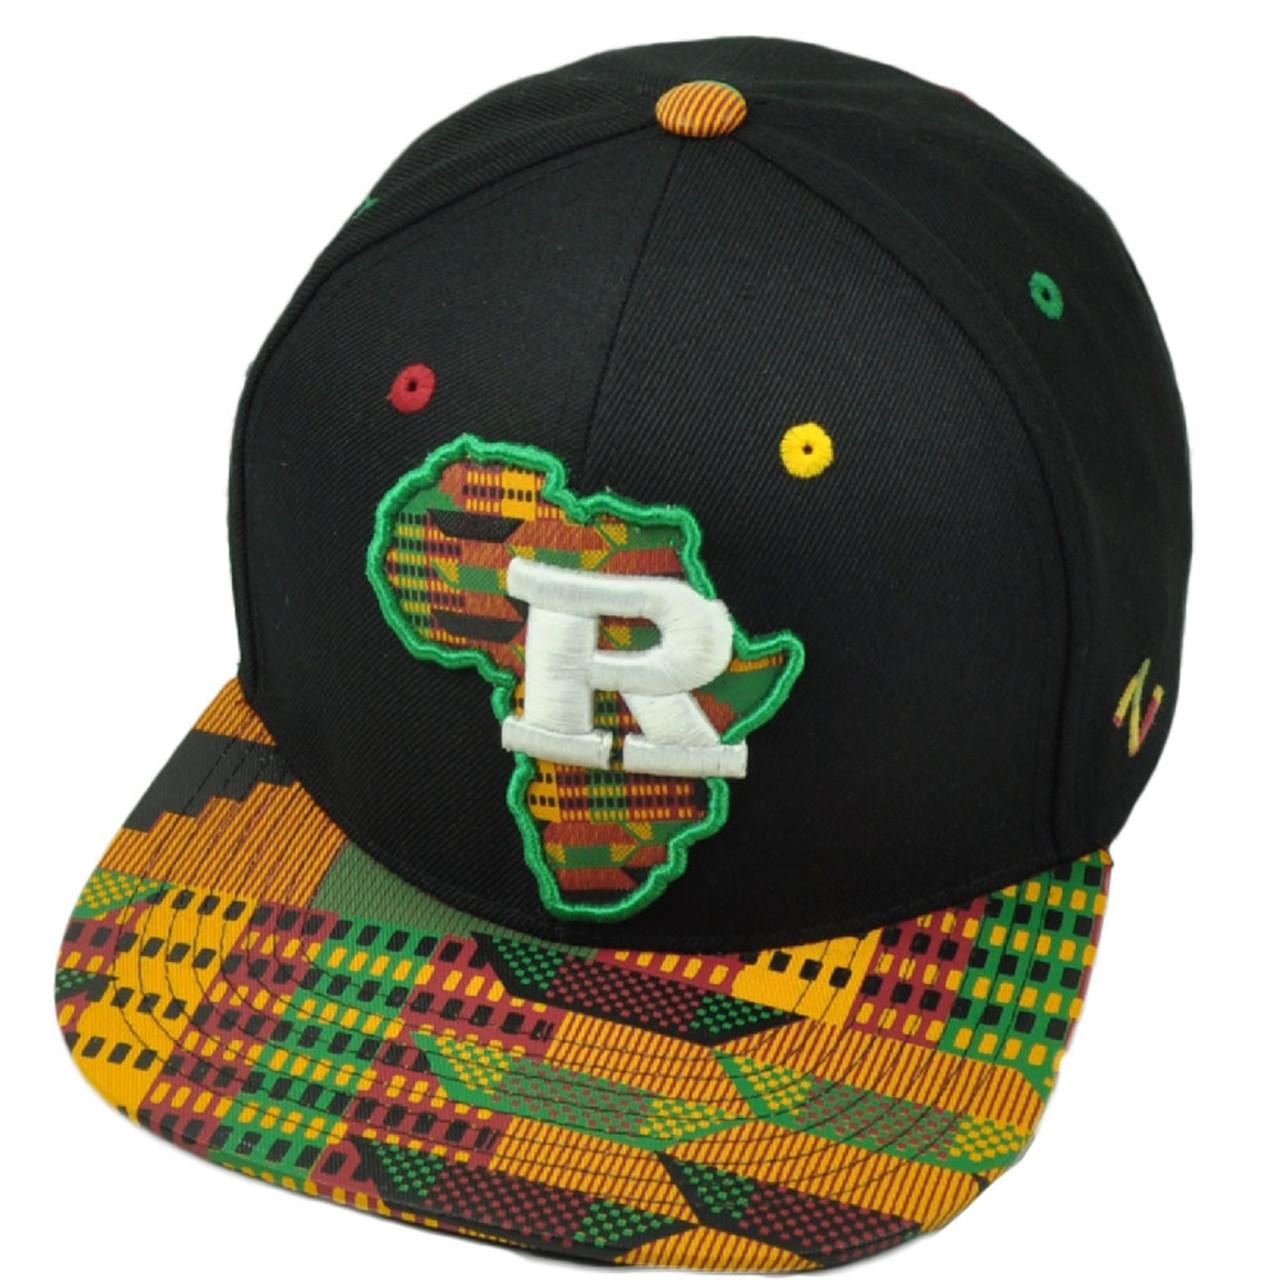 hot sale online e5362 31fd7 NCAA Zephyr Zukente Collection Rutgers Scarlet Knights Snapback Hat Cap  Black - Cap Store Online.com